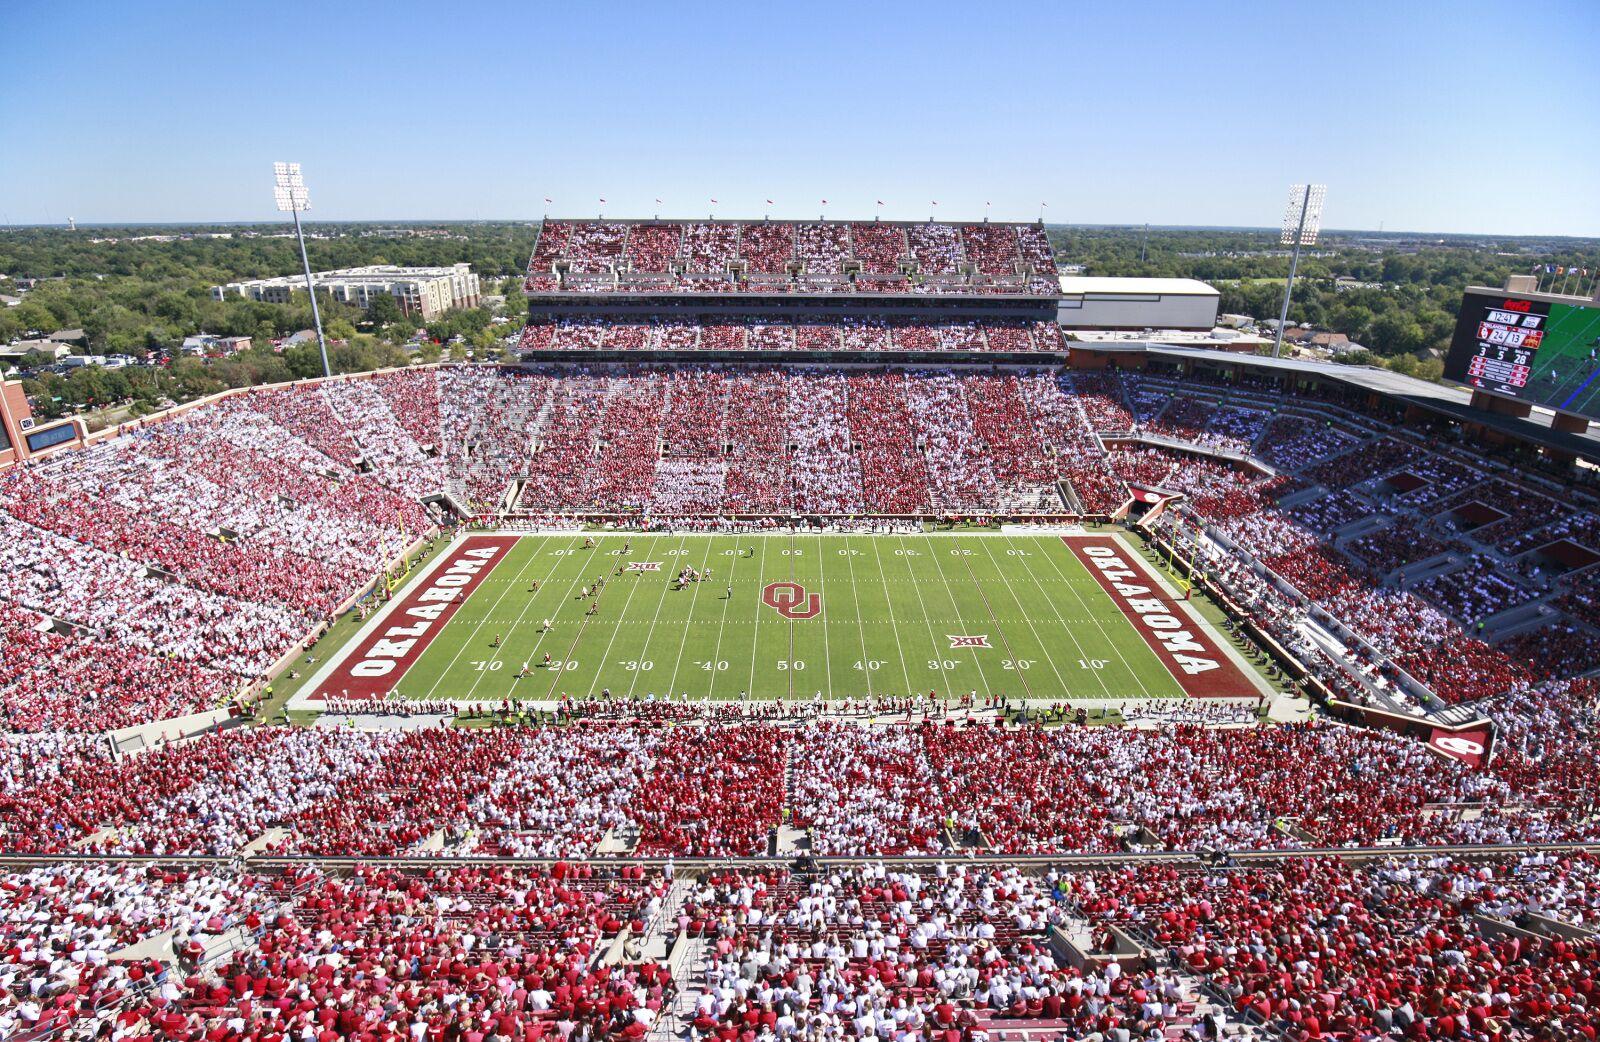 Oklahoma football: Sooners 'Way-too-Early' 2020 forecasts range from 5th to 8th